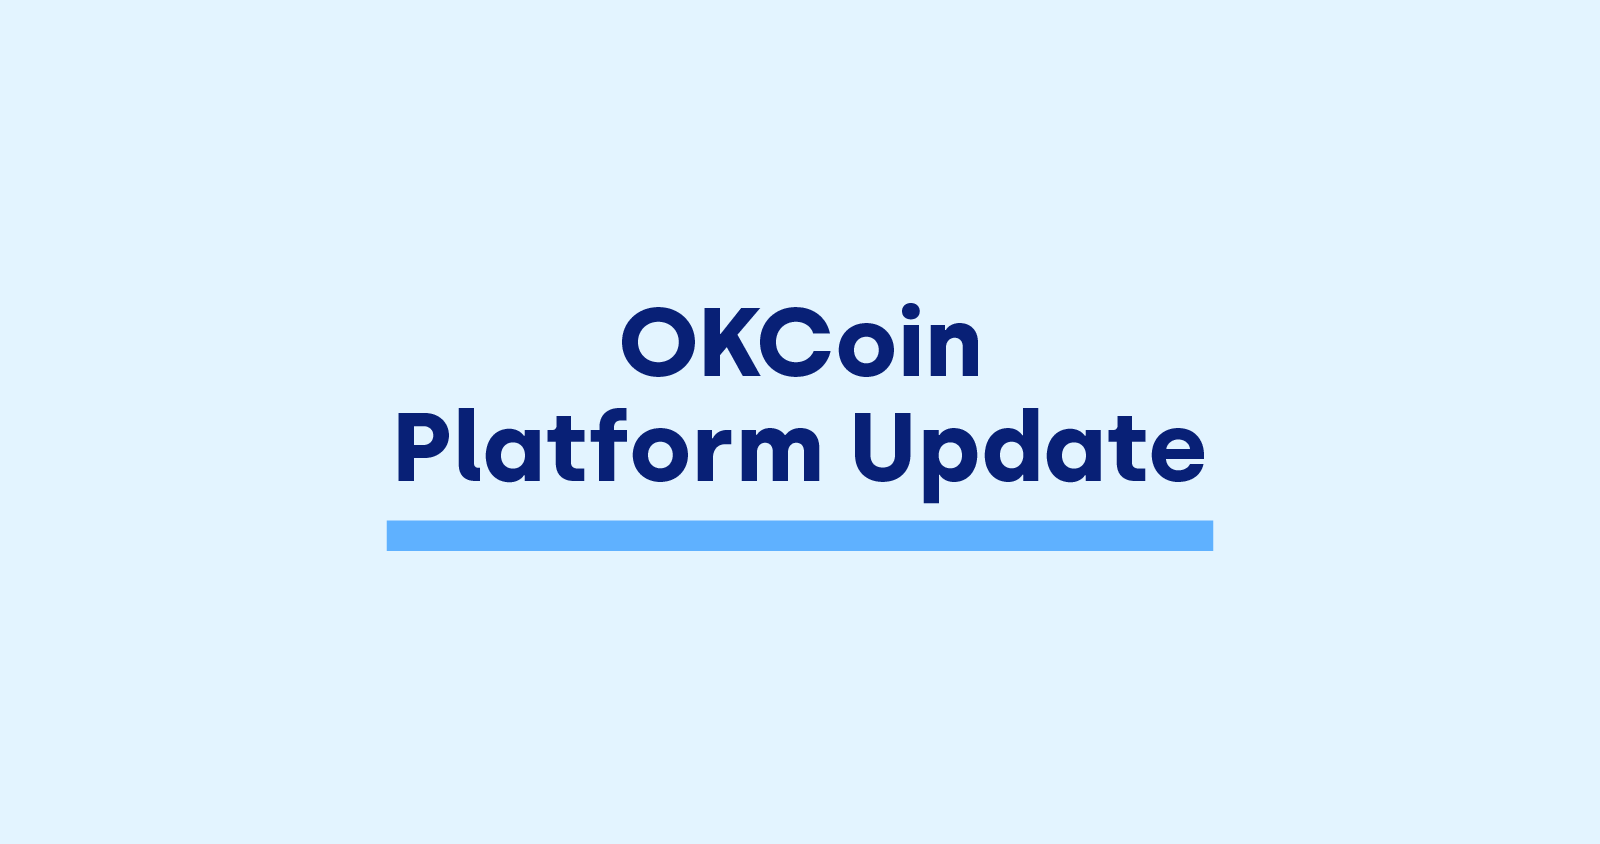 OKCoin platform update